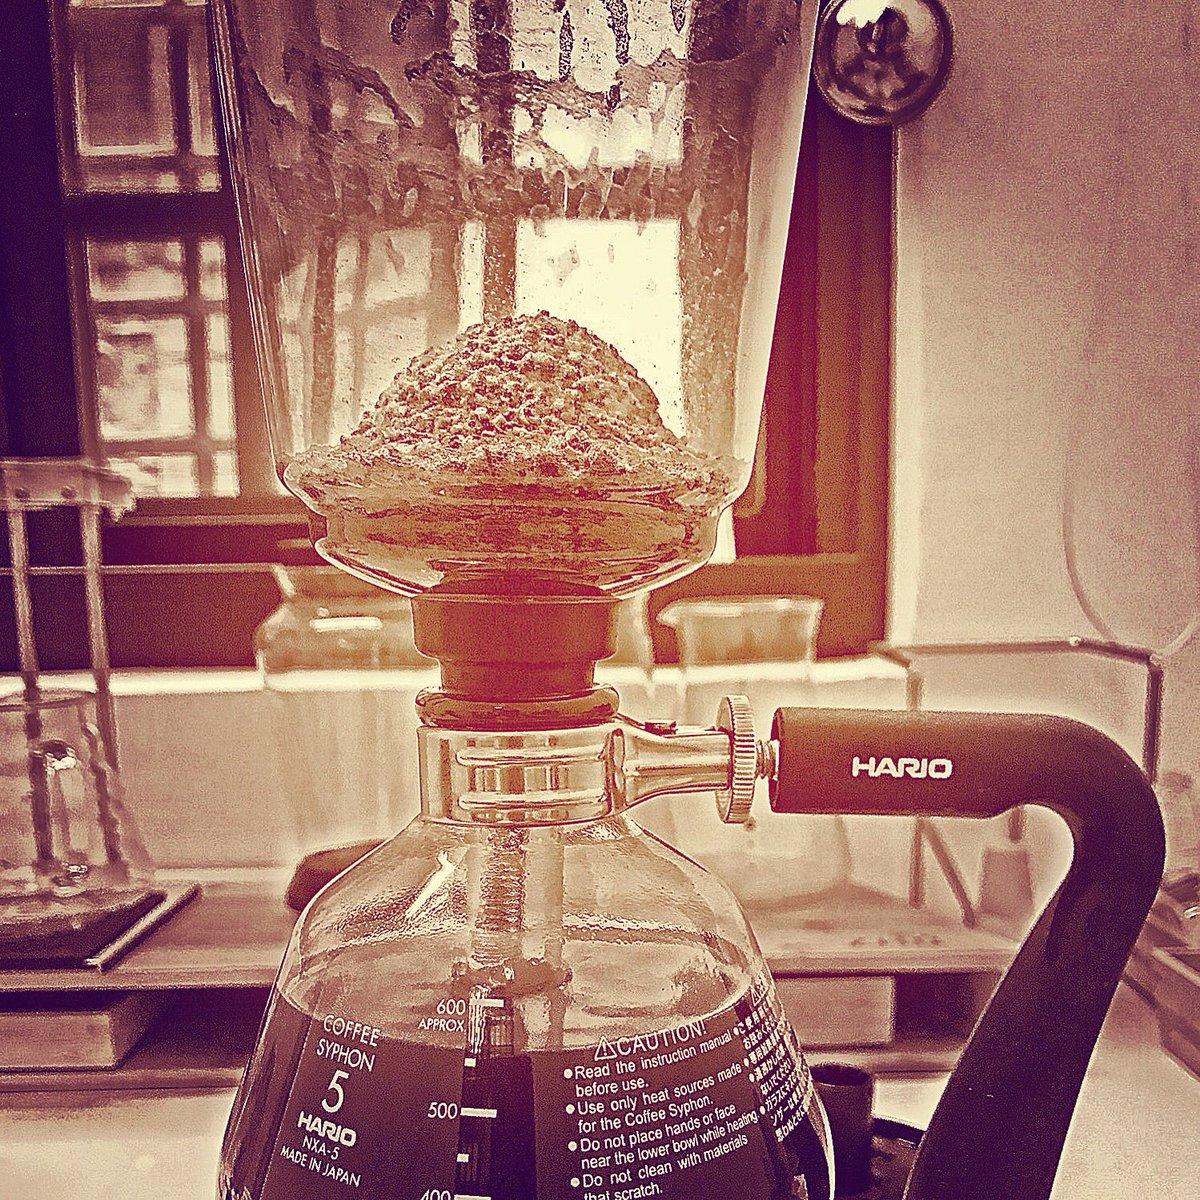 4jcoffee Twitter Hario Syphon Next Nxa 5 Followed